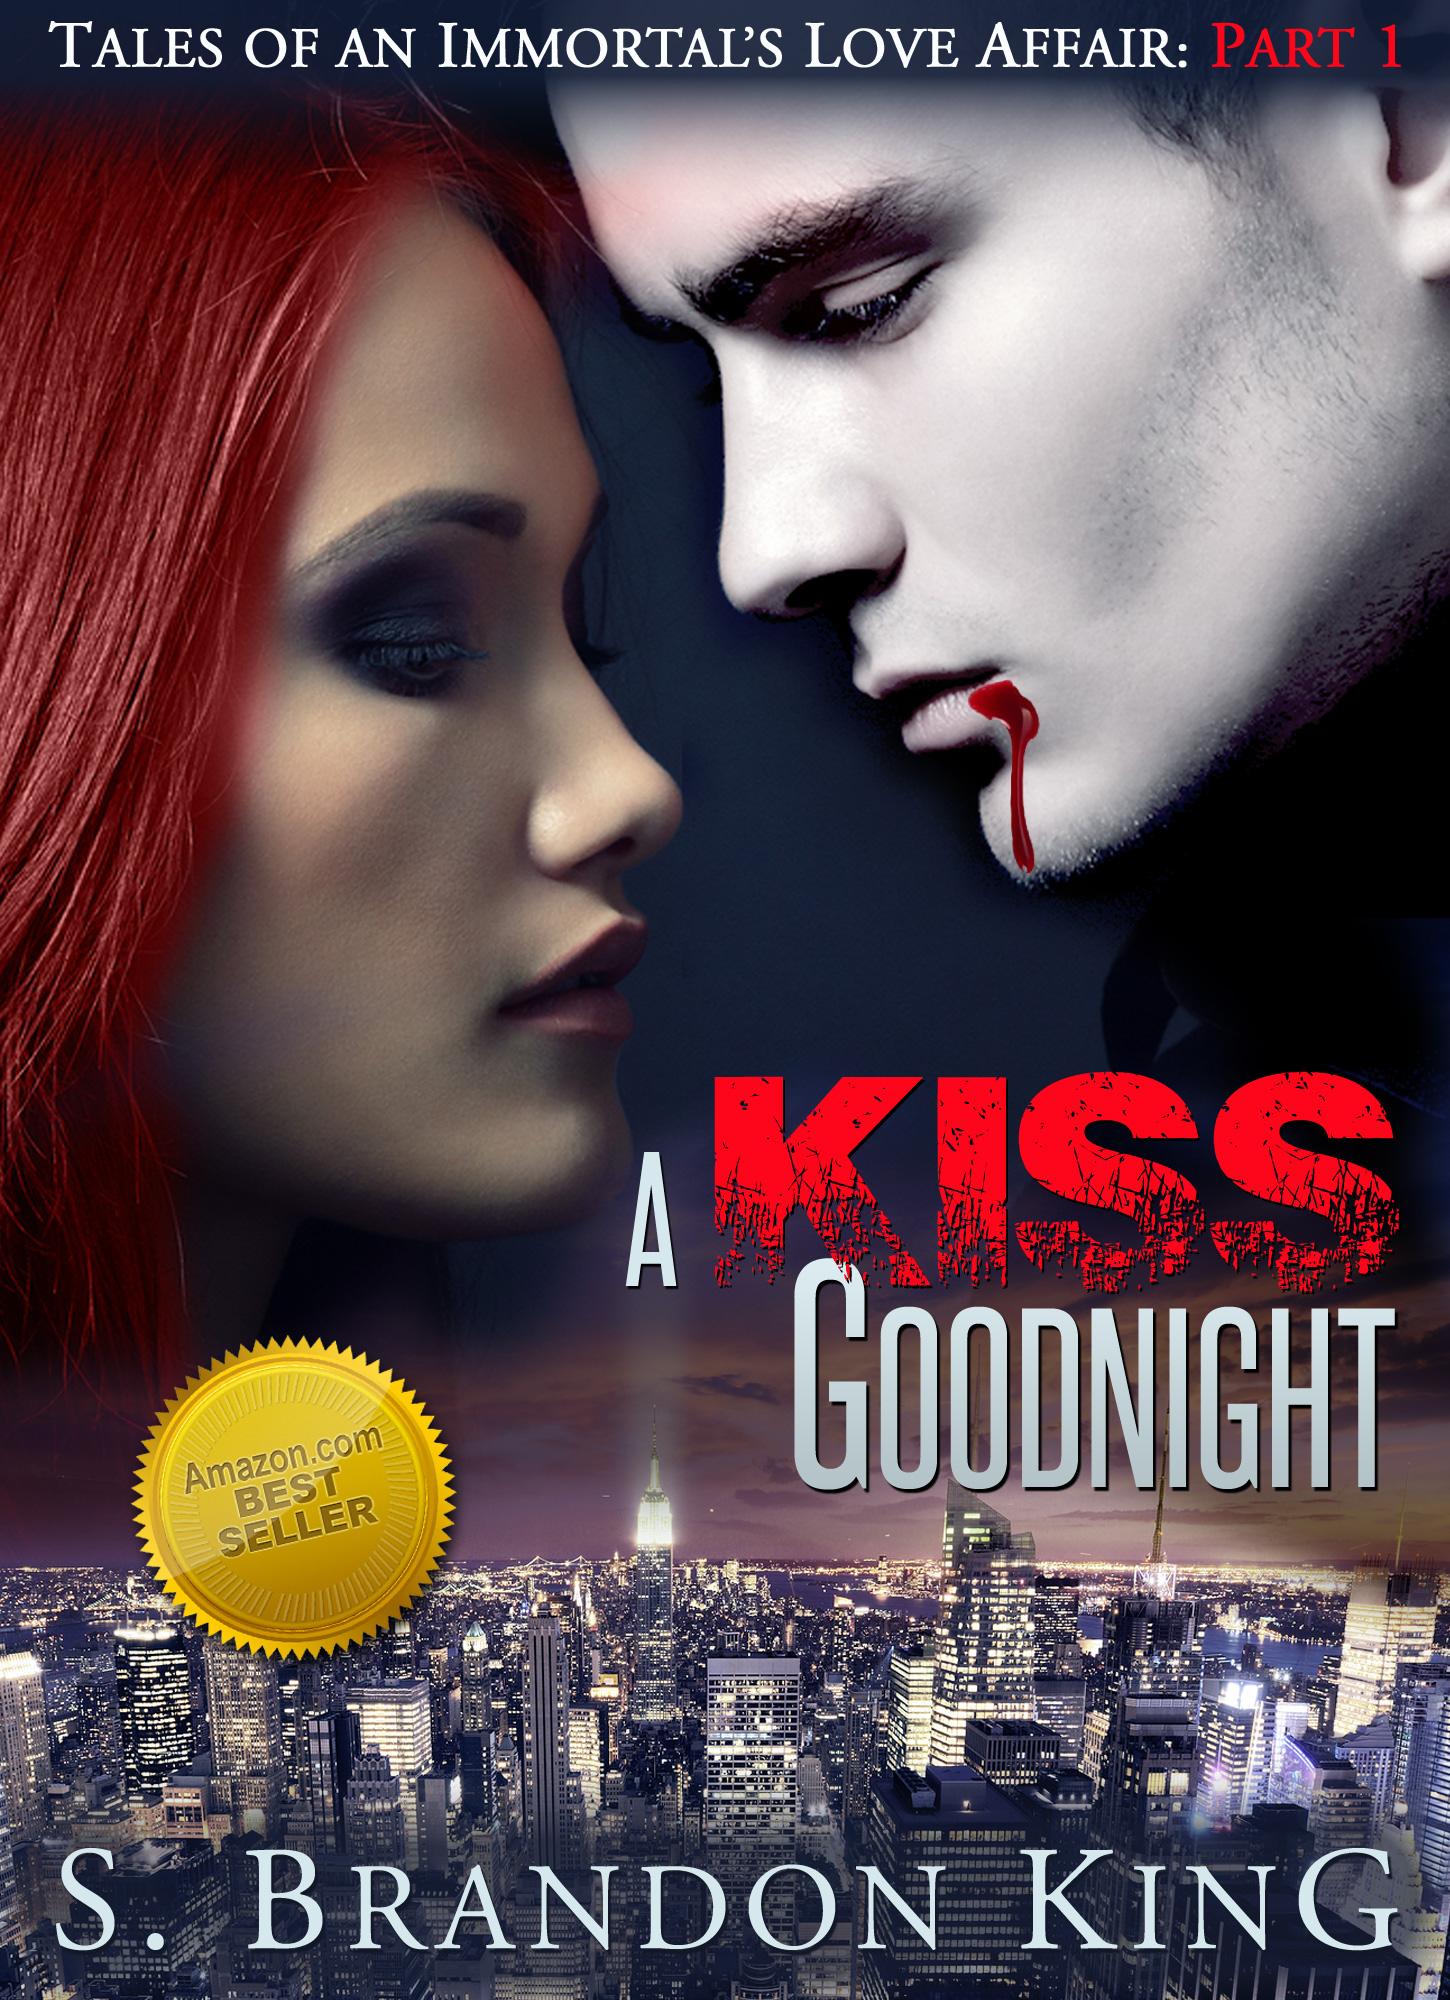 A Kiss Good Night, Tales Of An Immortal's Love Affair, Part 1